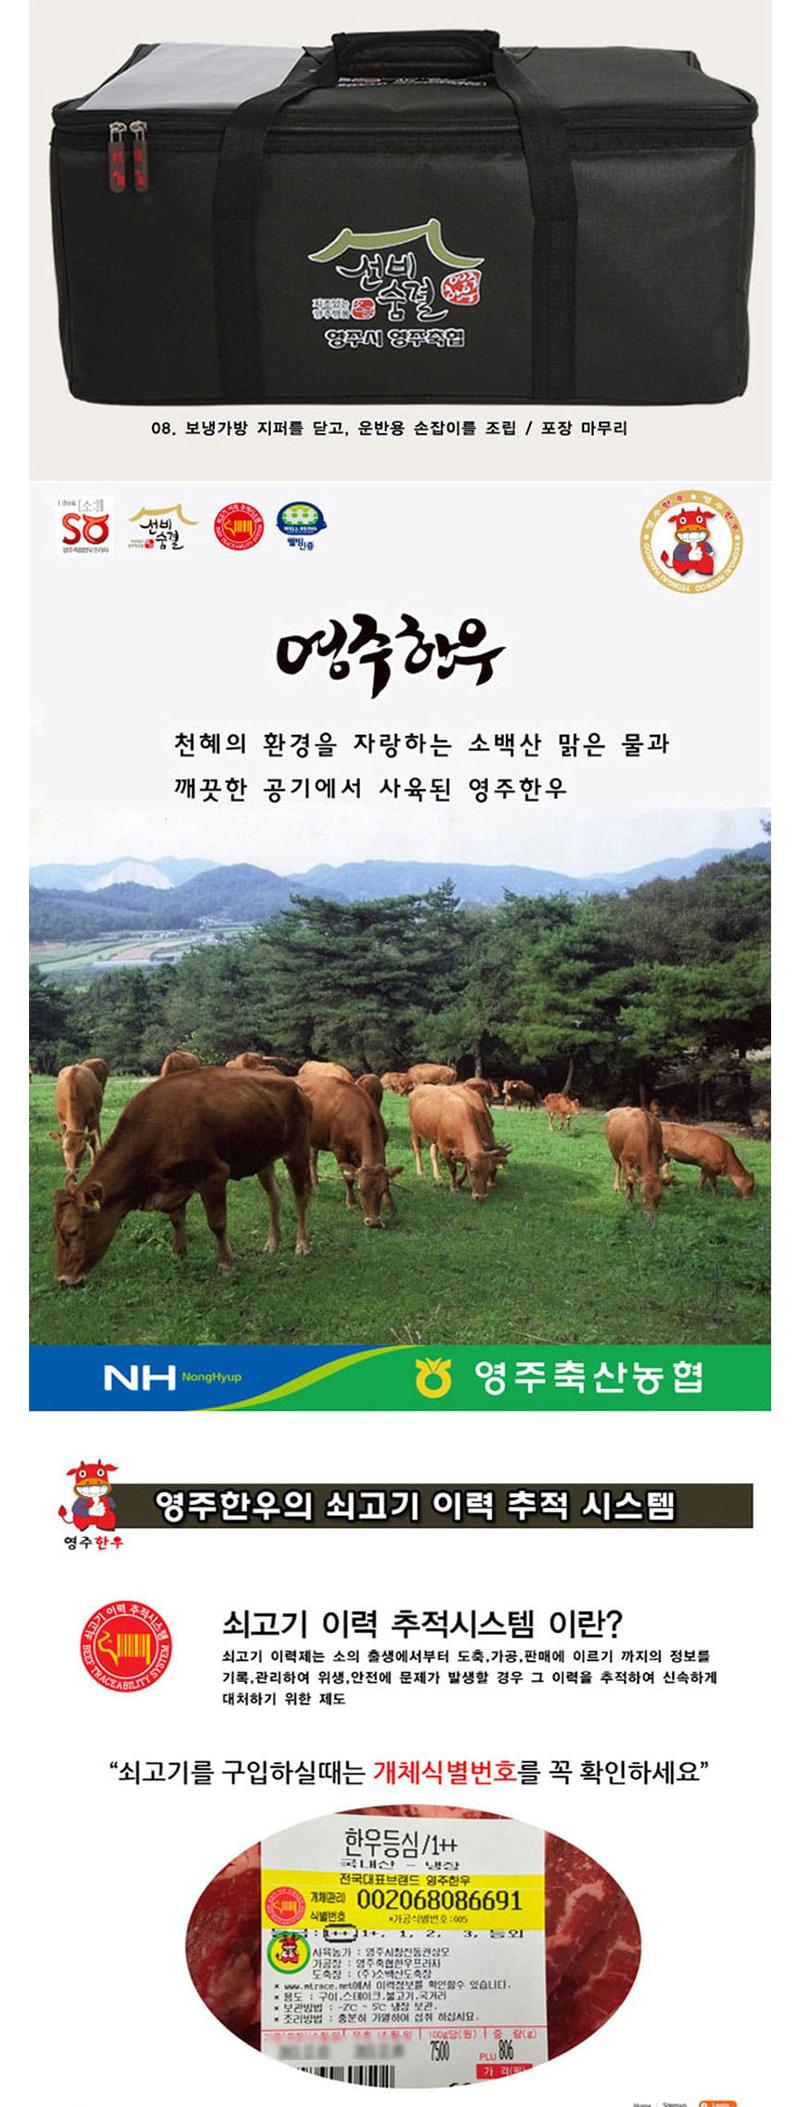 yeongjuchughyeob-myeongpum-set_detail_08.jpg